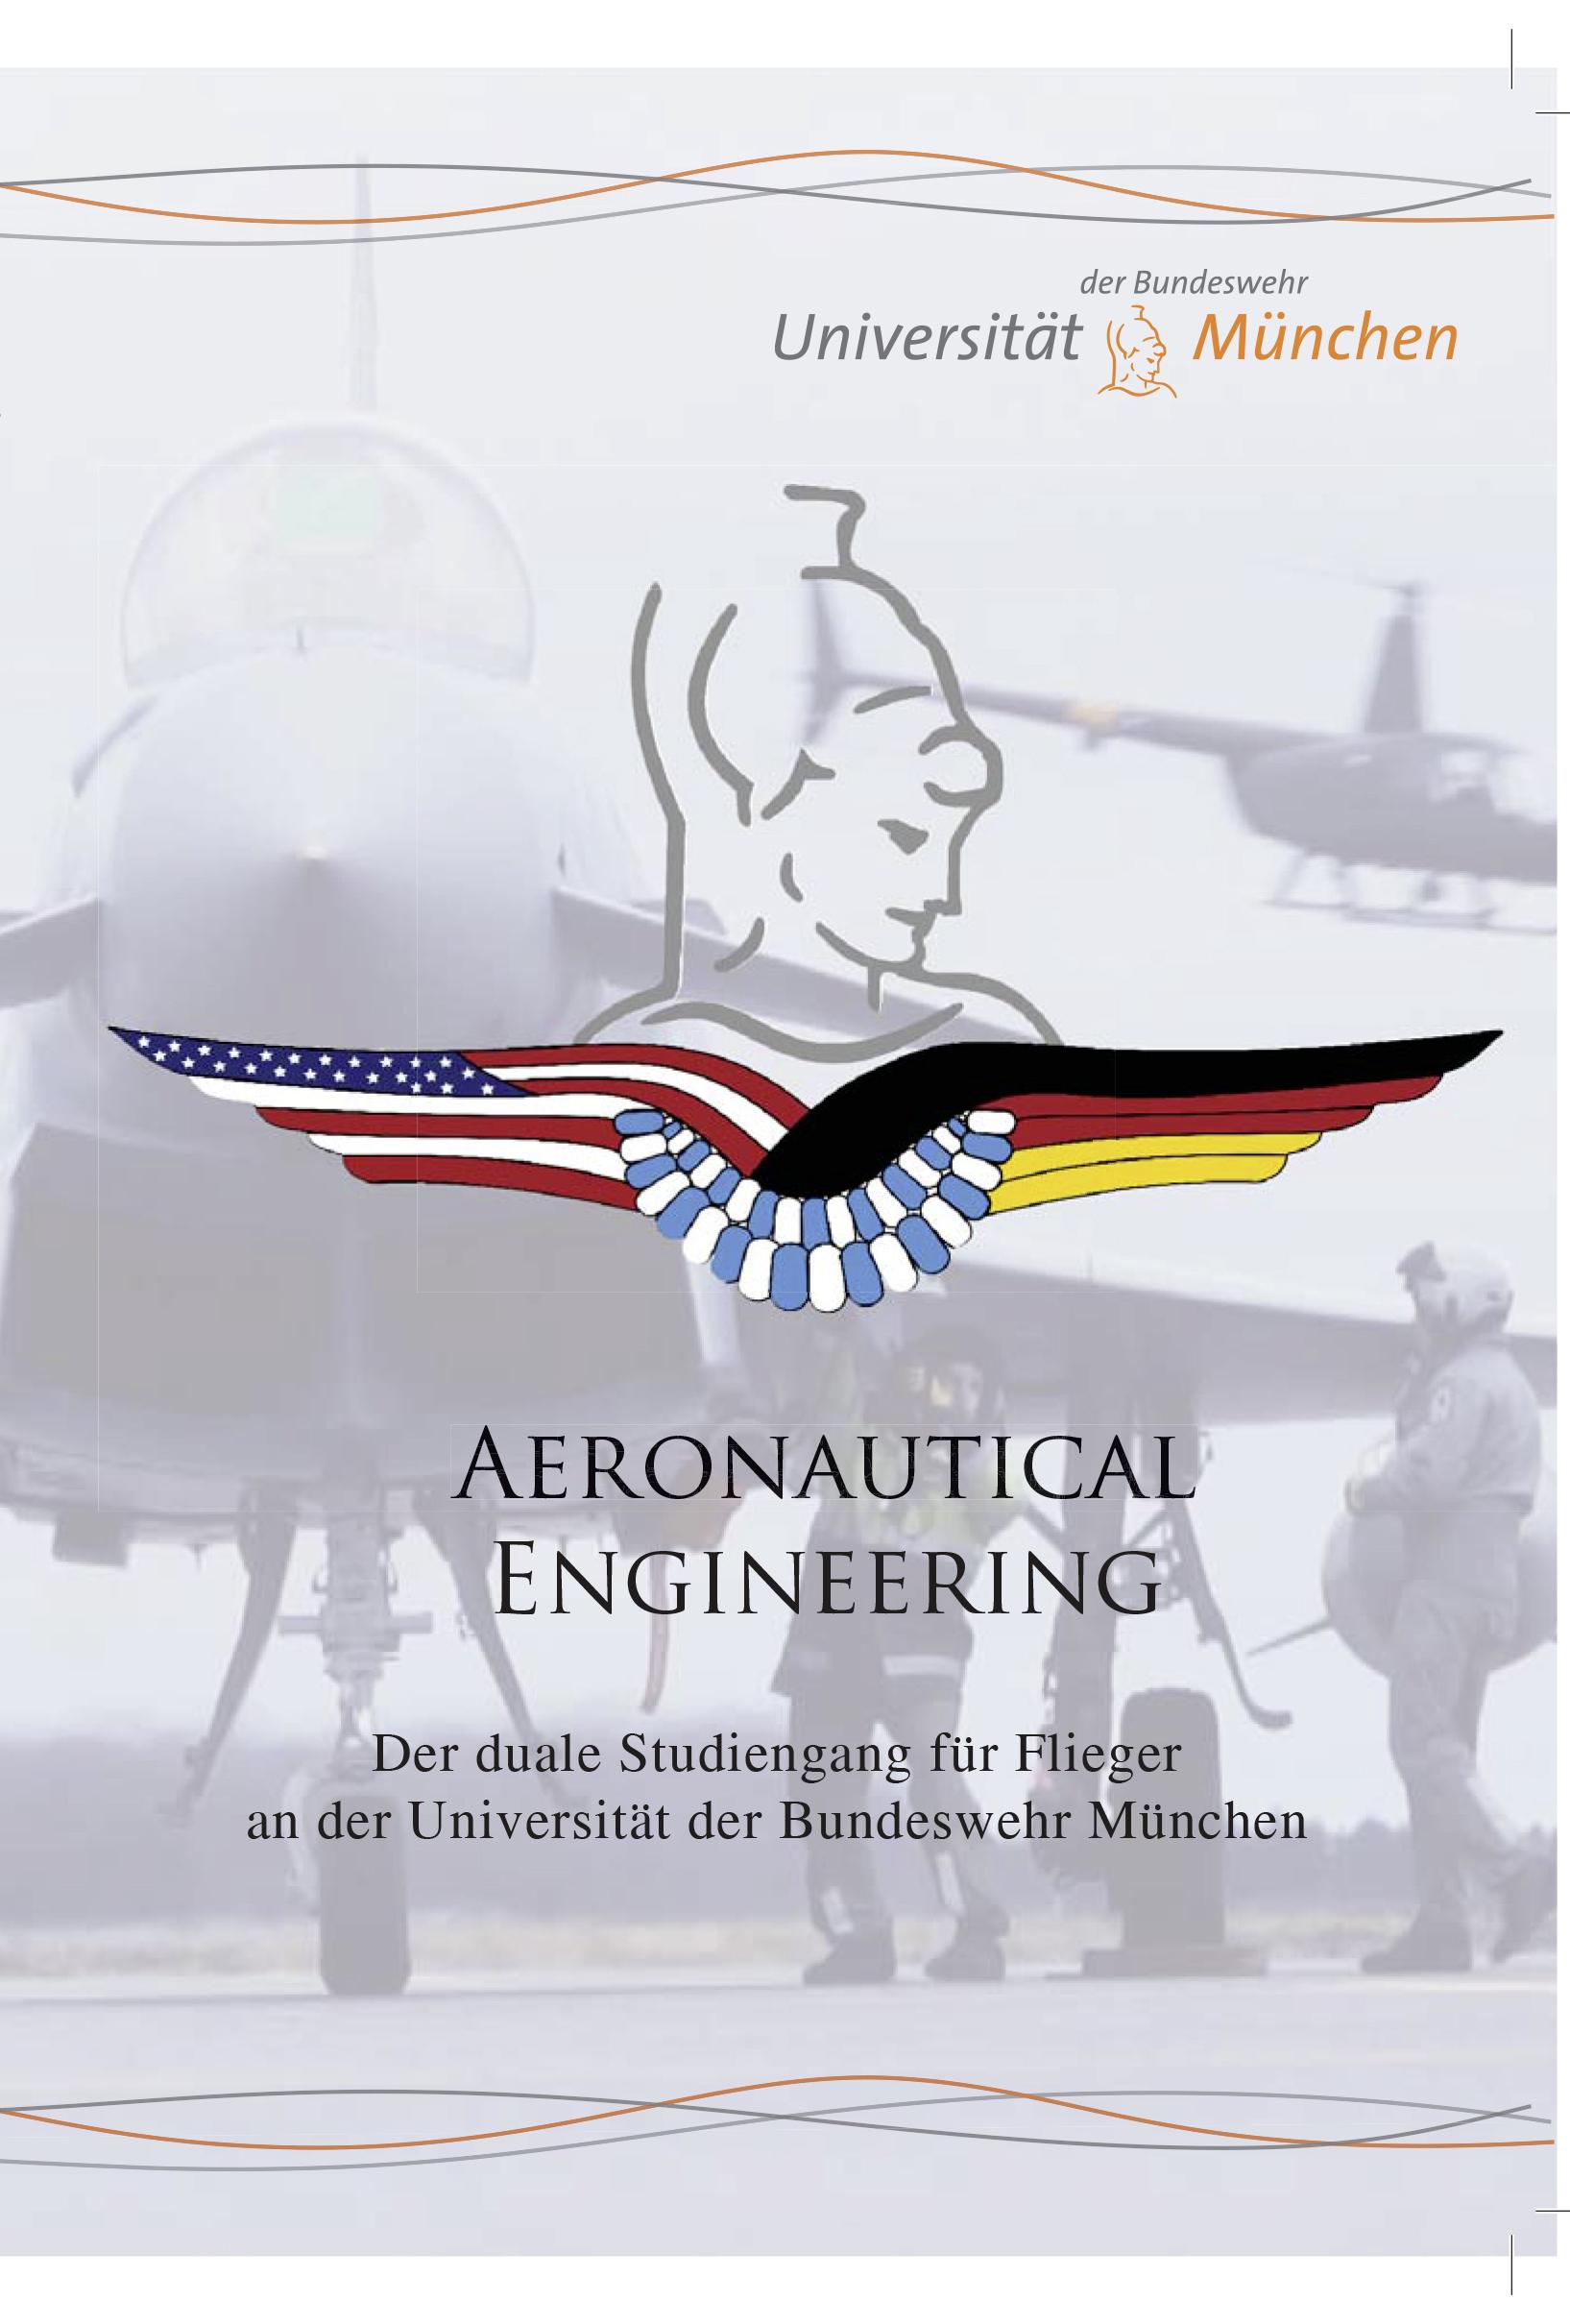 Aeronautical-Engineering-2016-cover.jpg